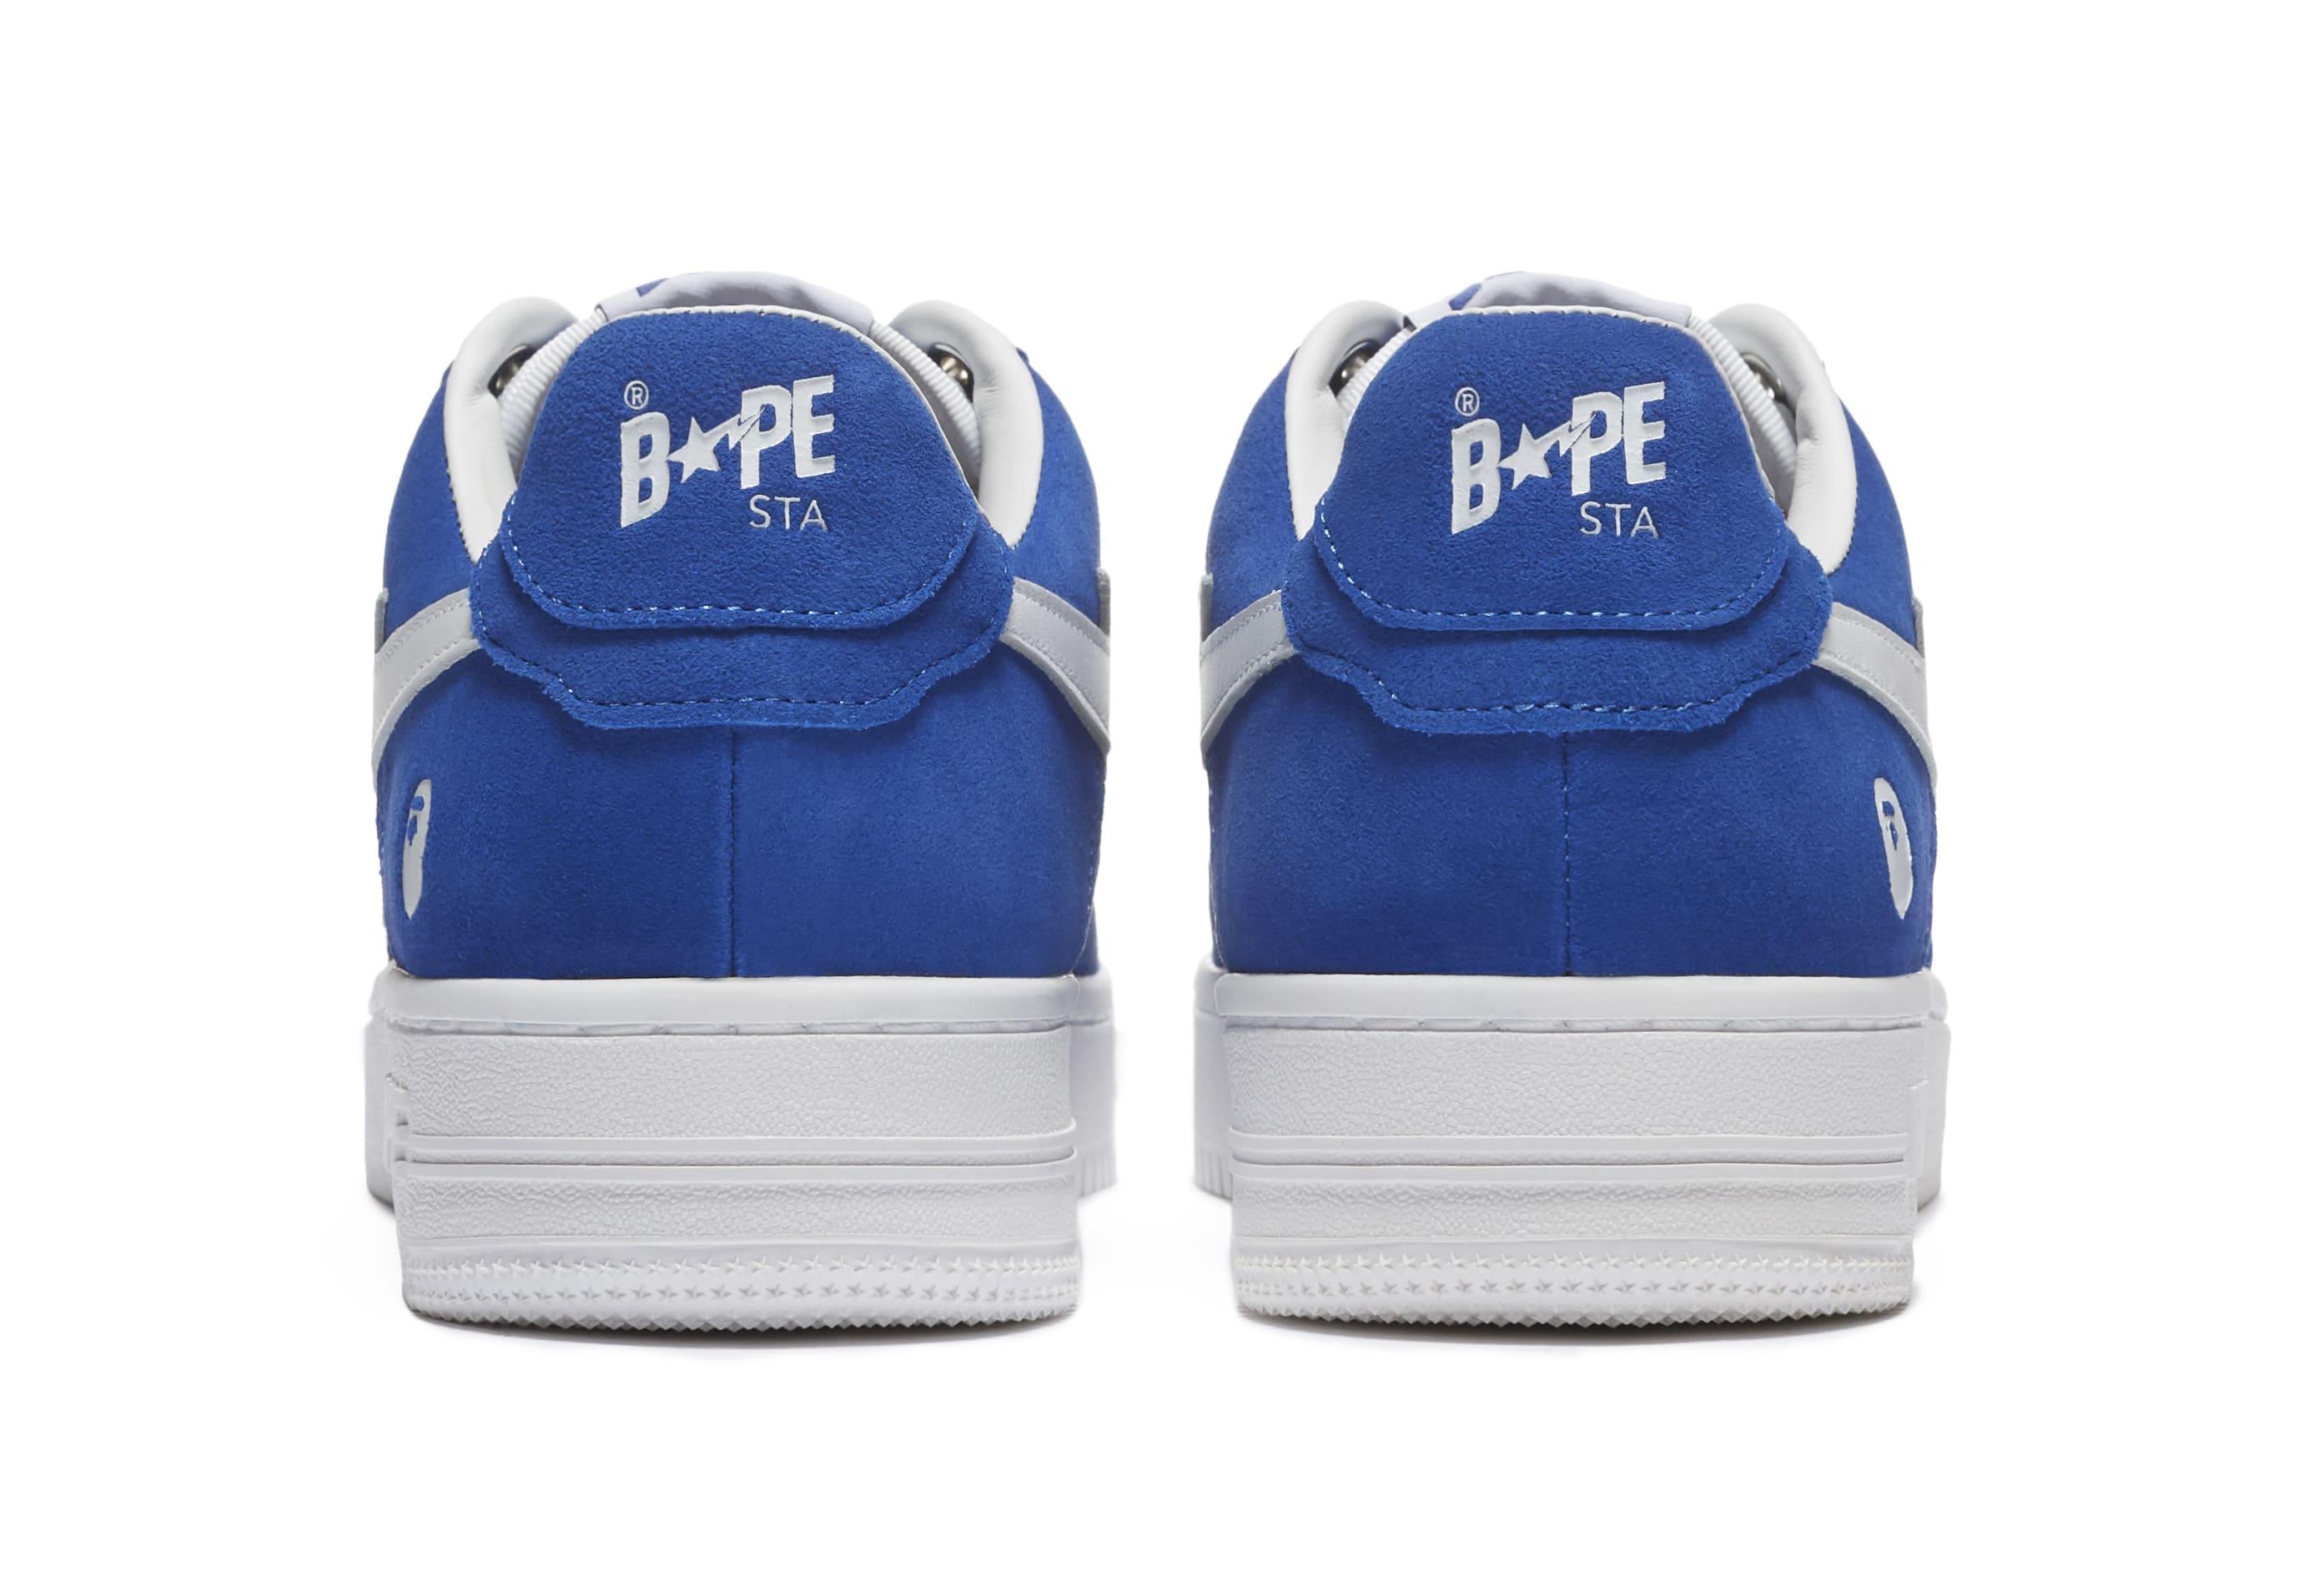 Bape Sta Suede 'Blue' Heel